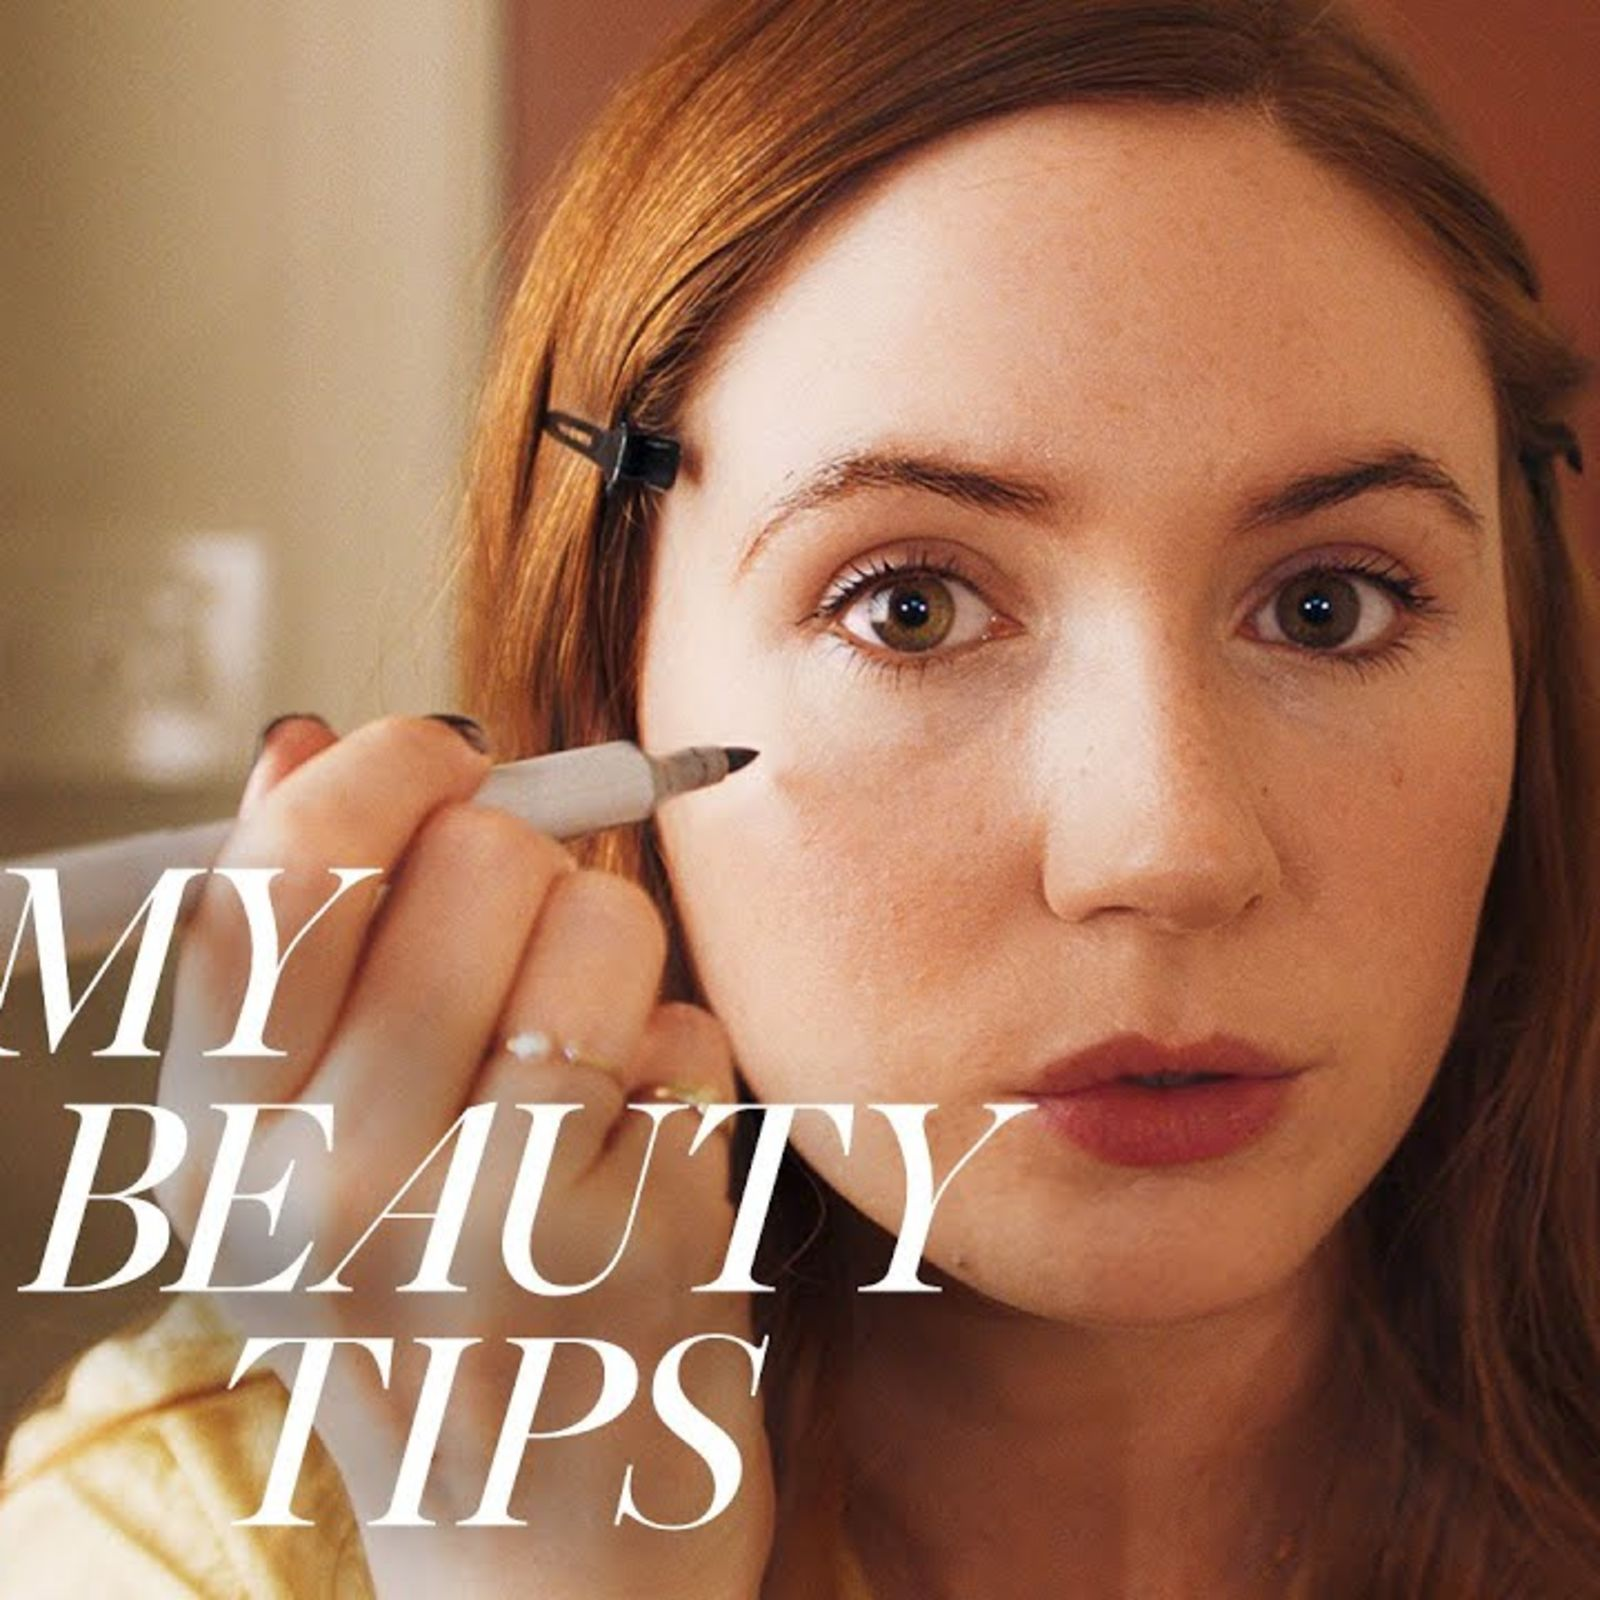 Avengers Karen Gillan's Guide To Everyday Natural Makeup | My Beauty Tips